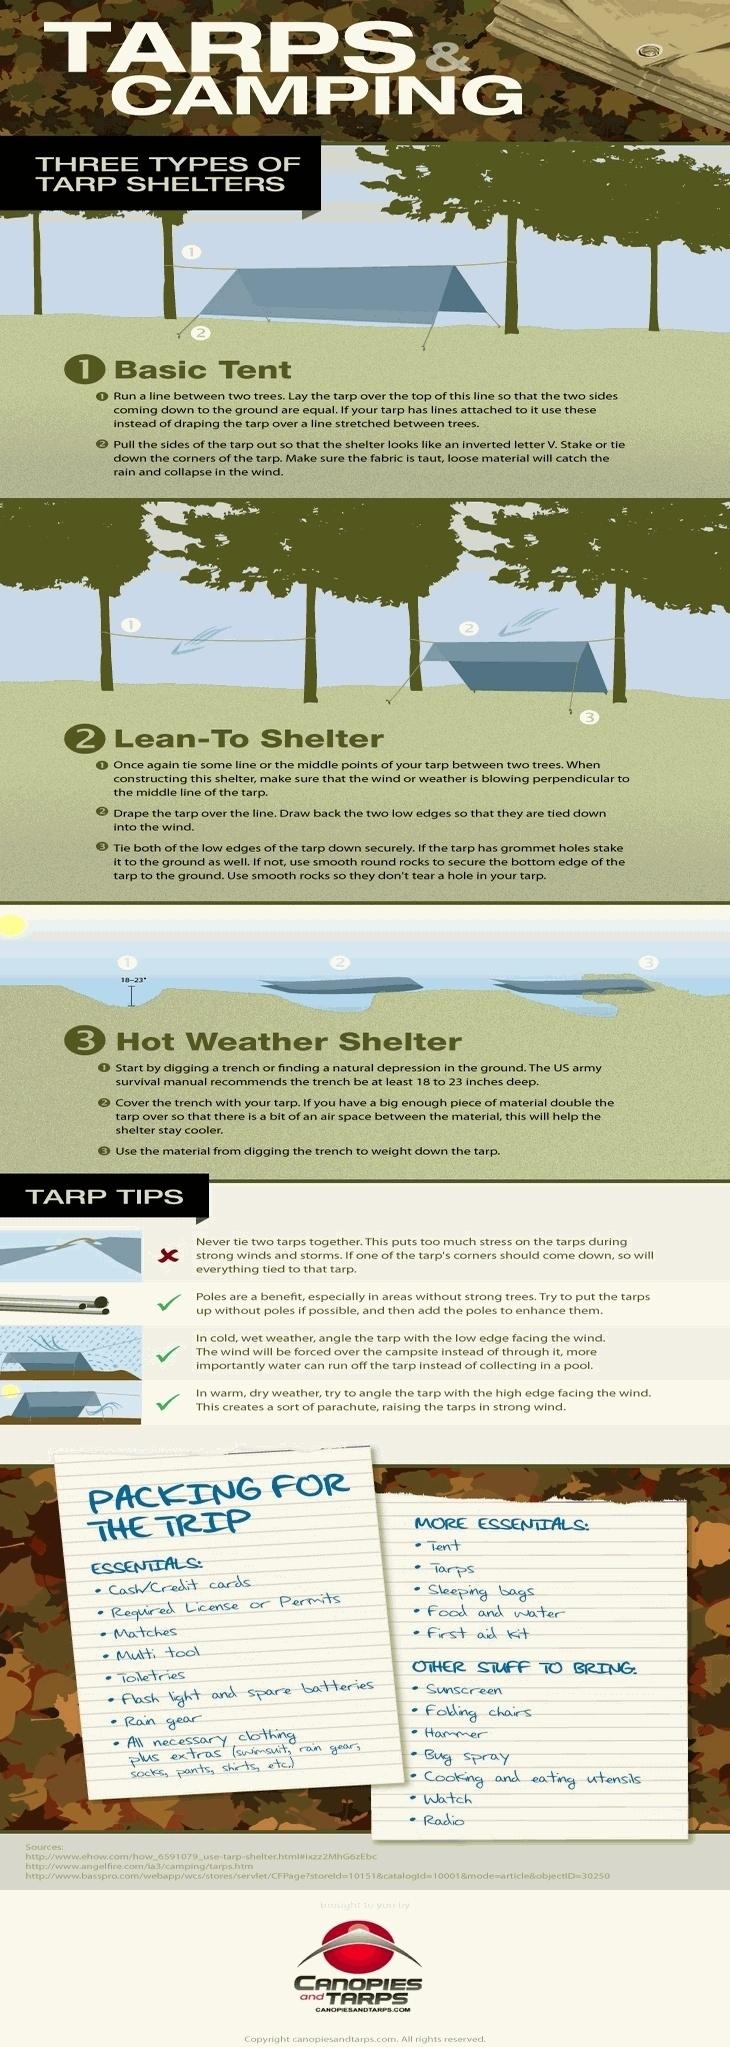 Tarp Tips - canopiesandtarps.com